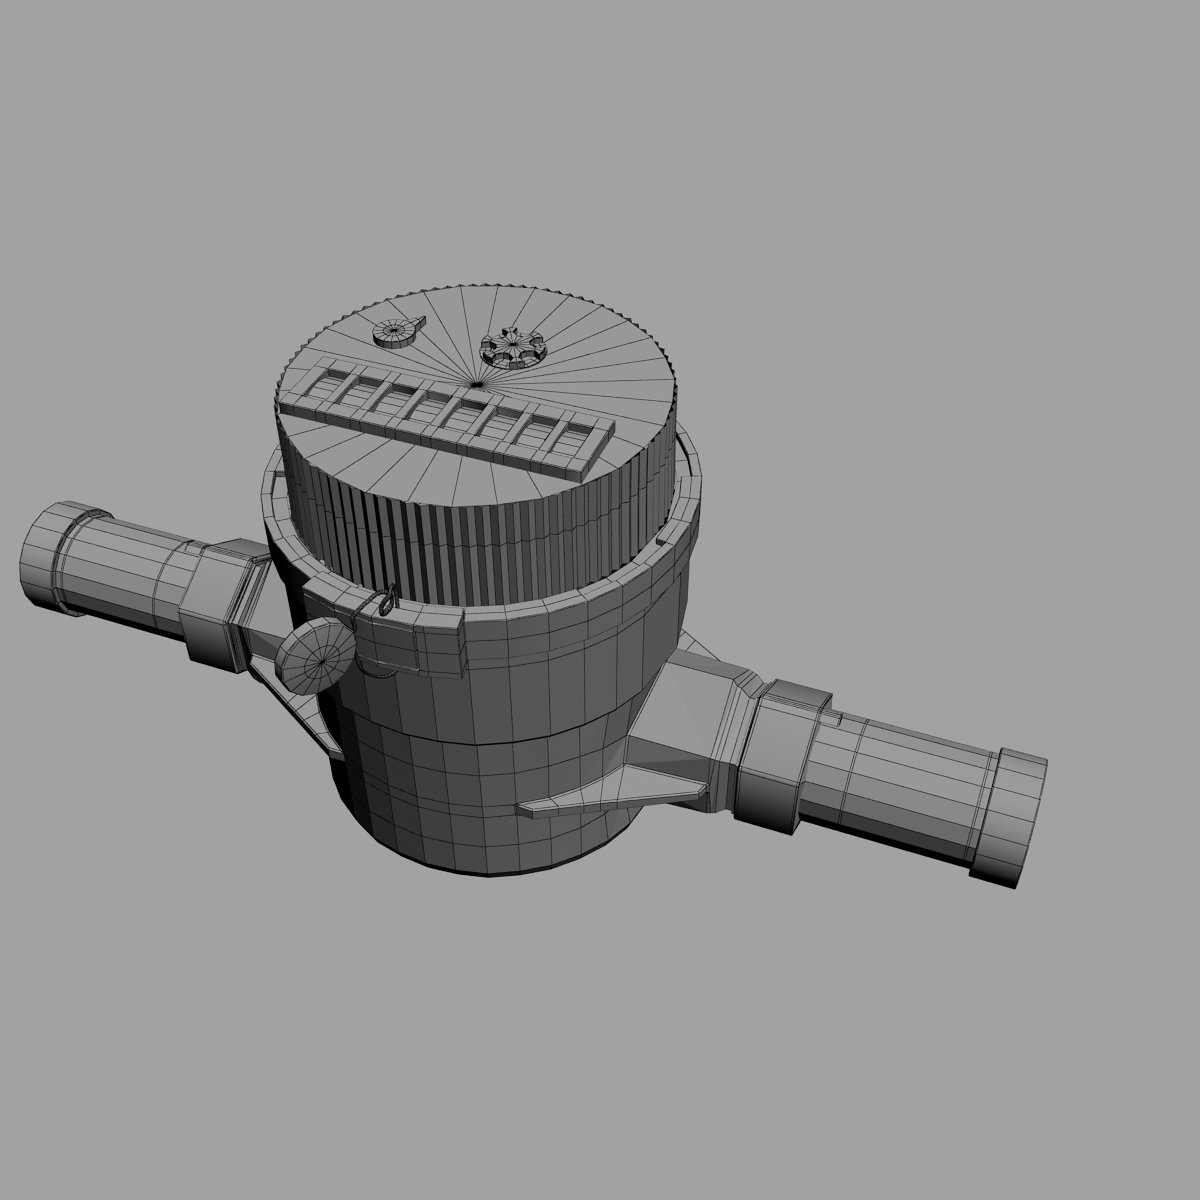 3d cad residential water meter model - Water Counter Meter Remove Bookmark Bookmark This Item